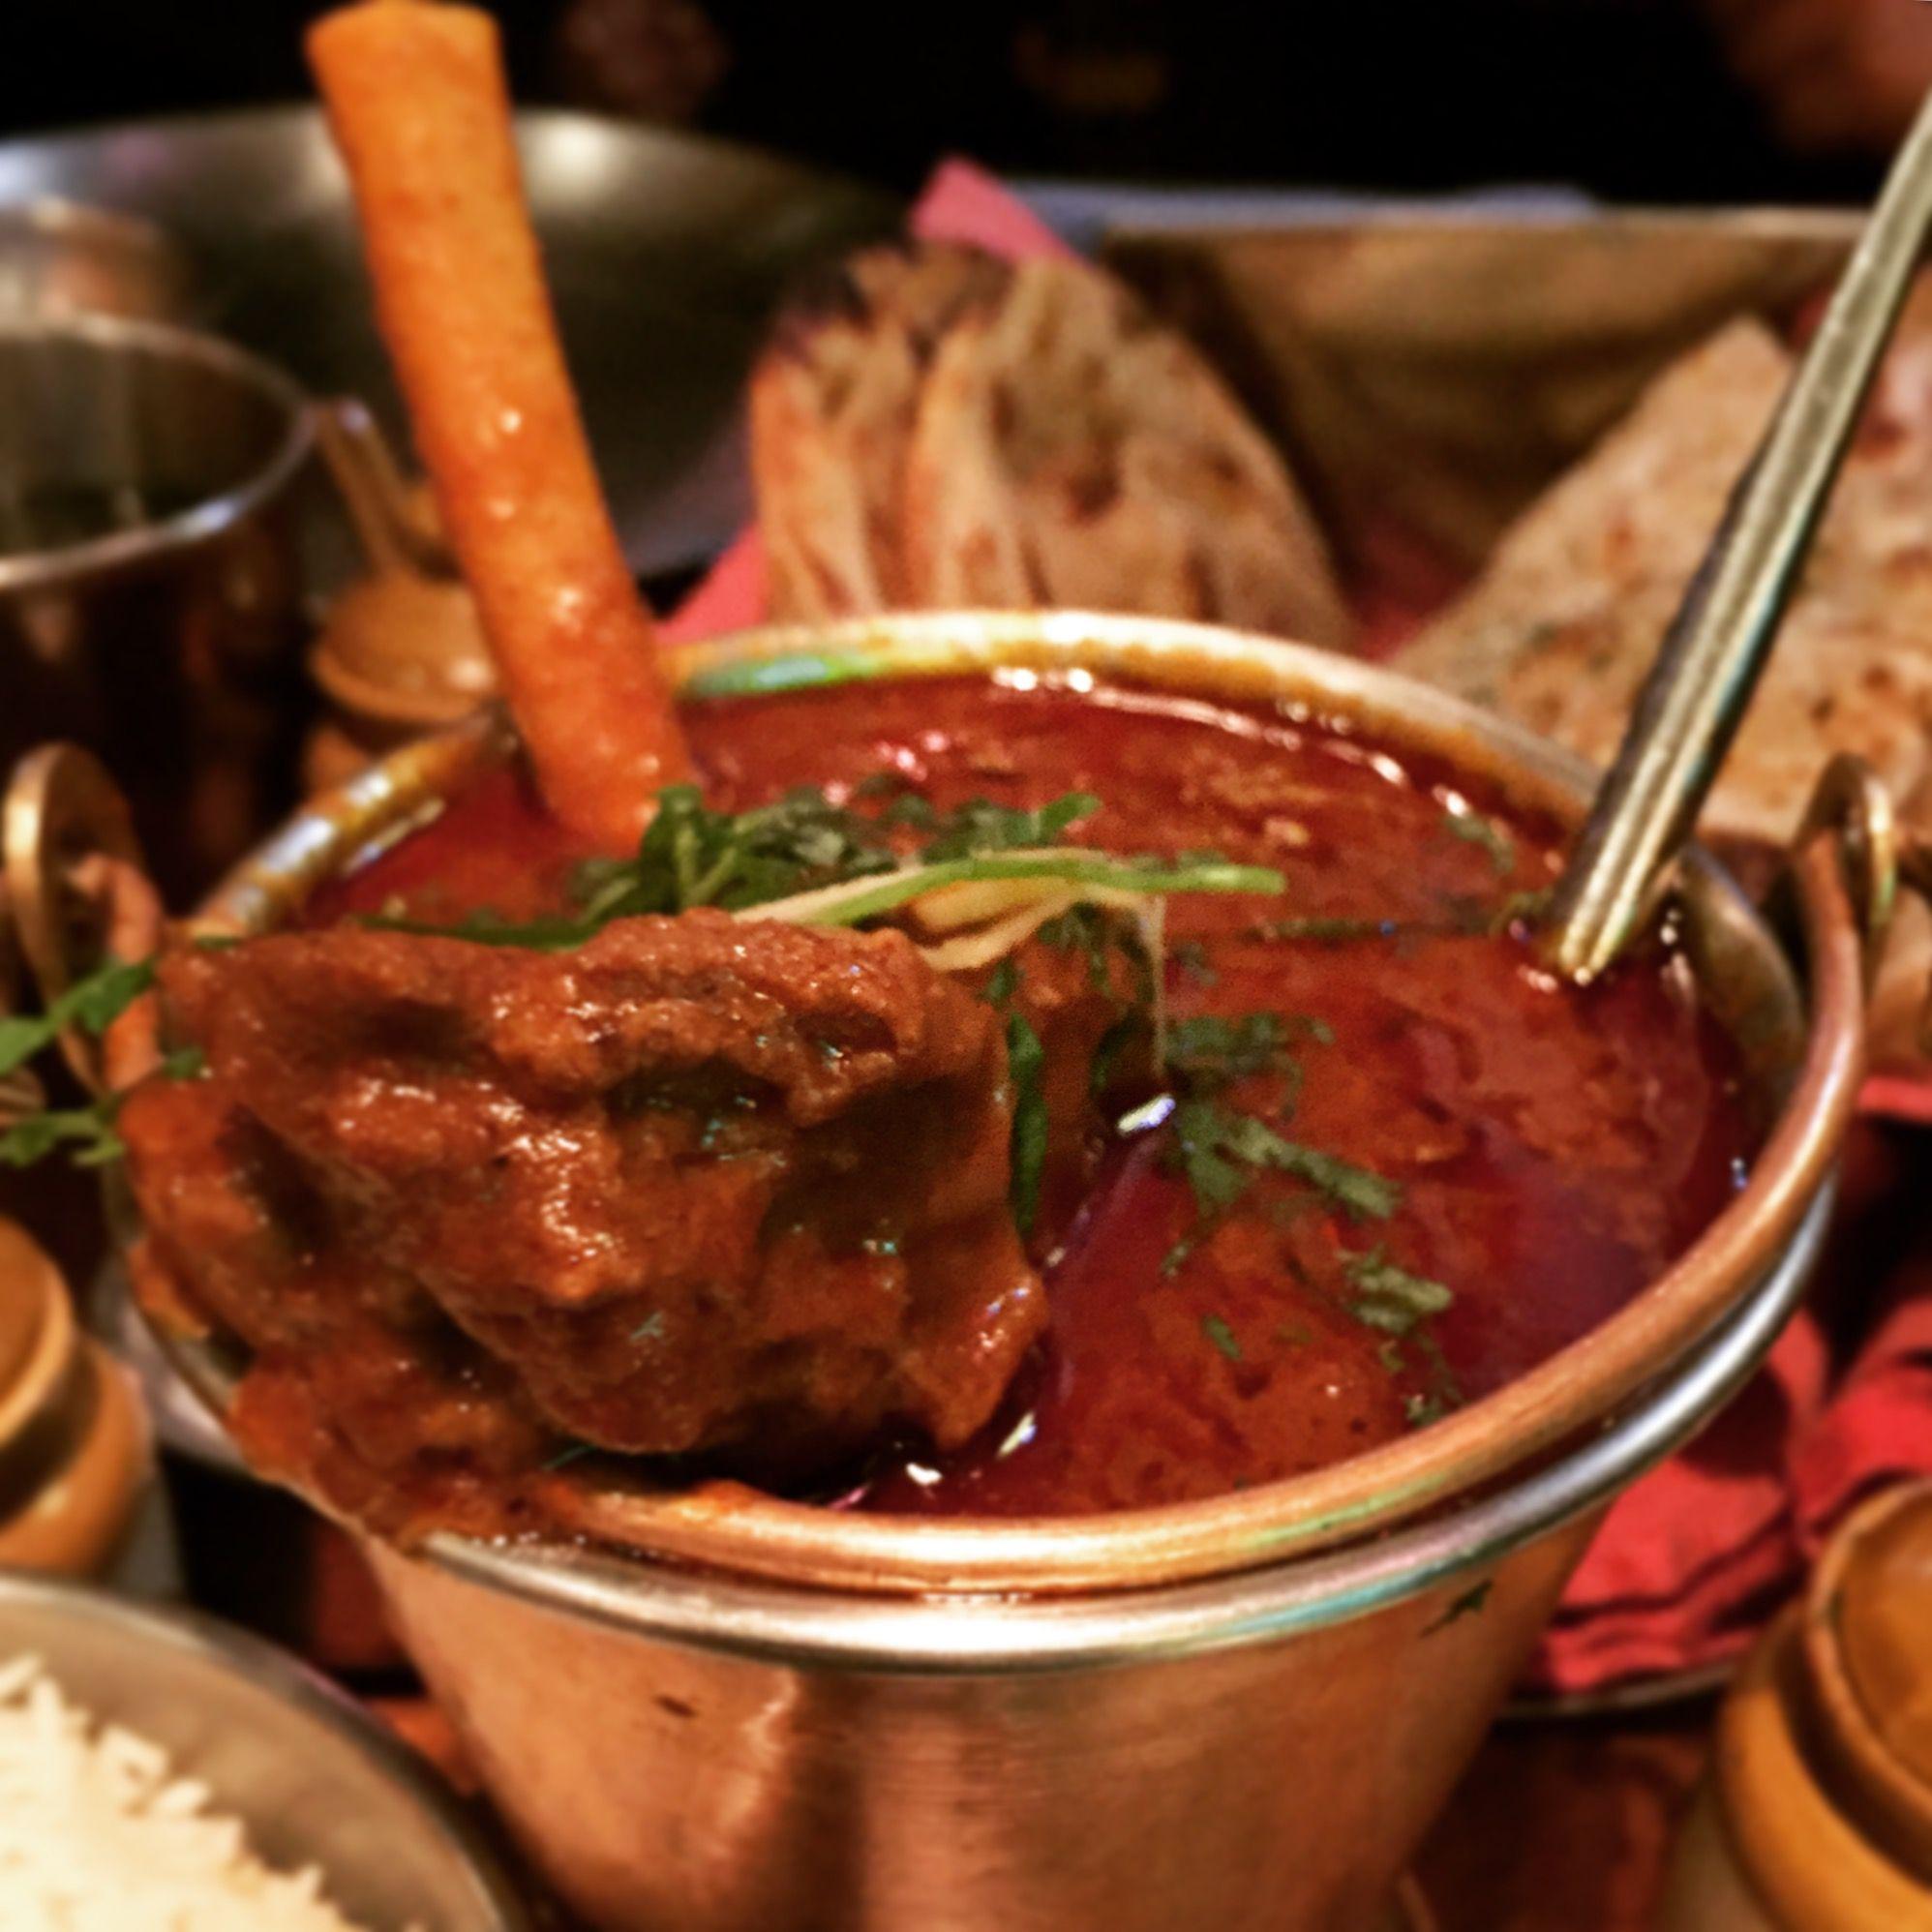 Dhabe ka gosht highway lamb curry curry lambs and curries dhabe ka gosht highway lamb curry indian recipesindian forumfinder Gallery